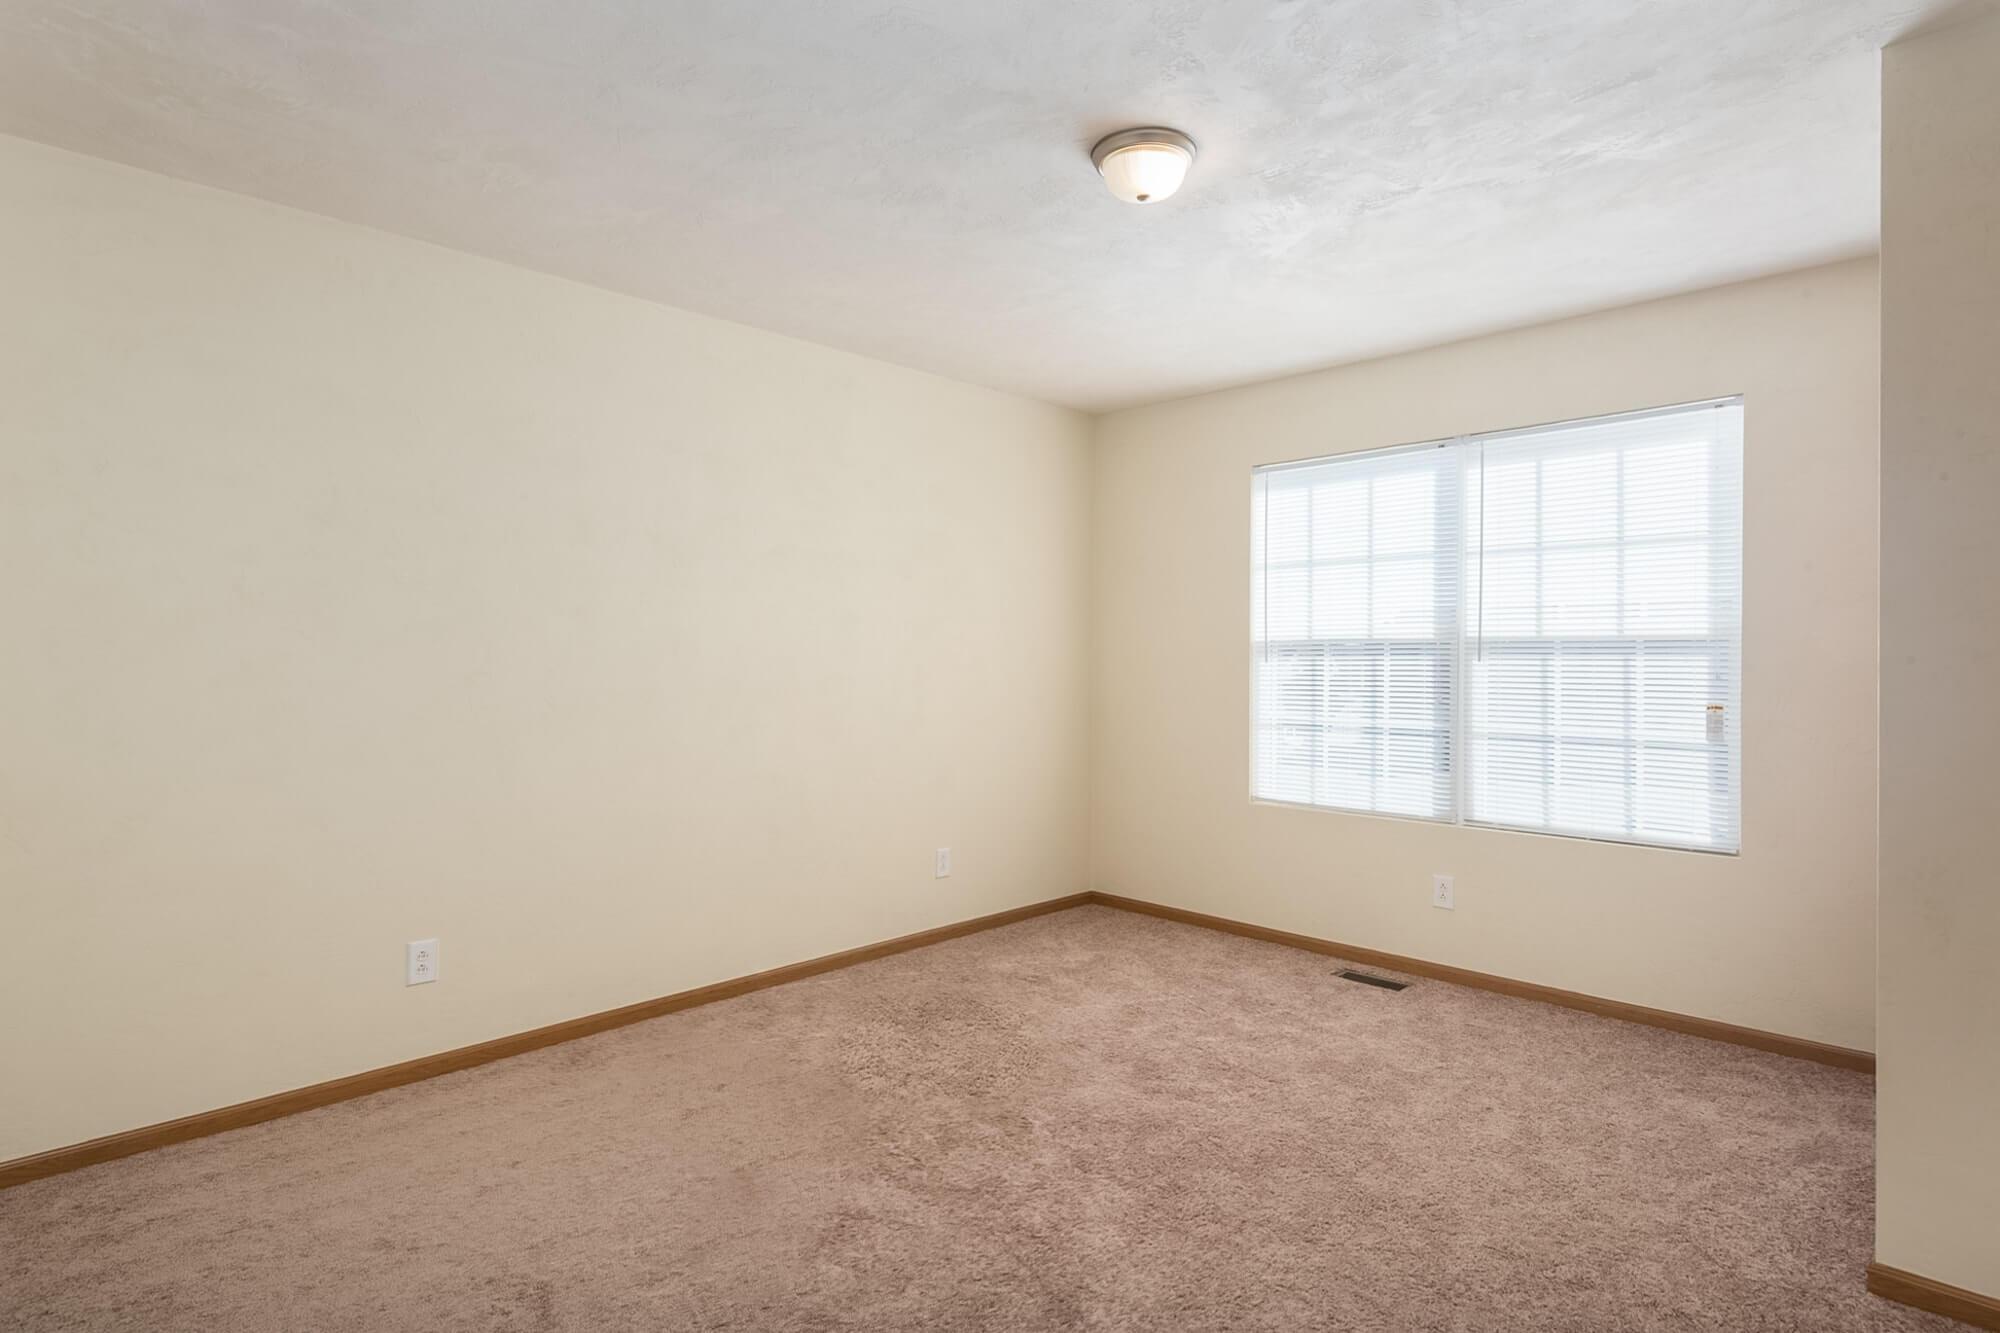 Two Bedroom Apartment Lebanon, IL